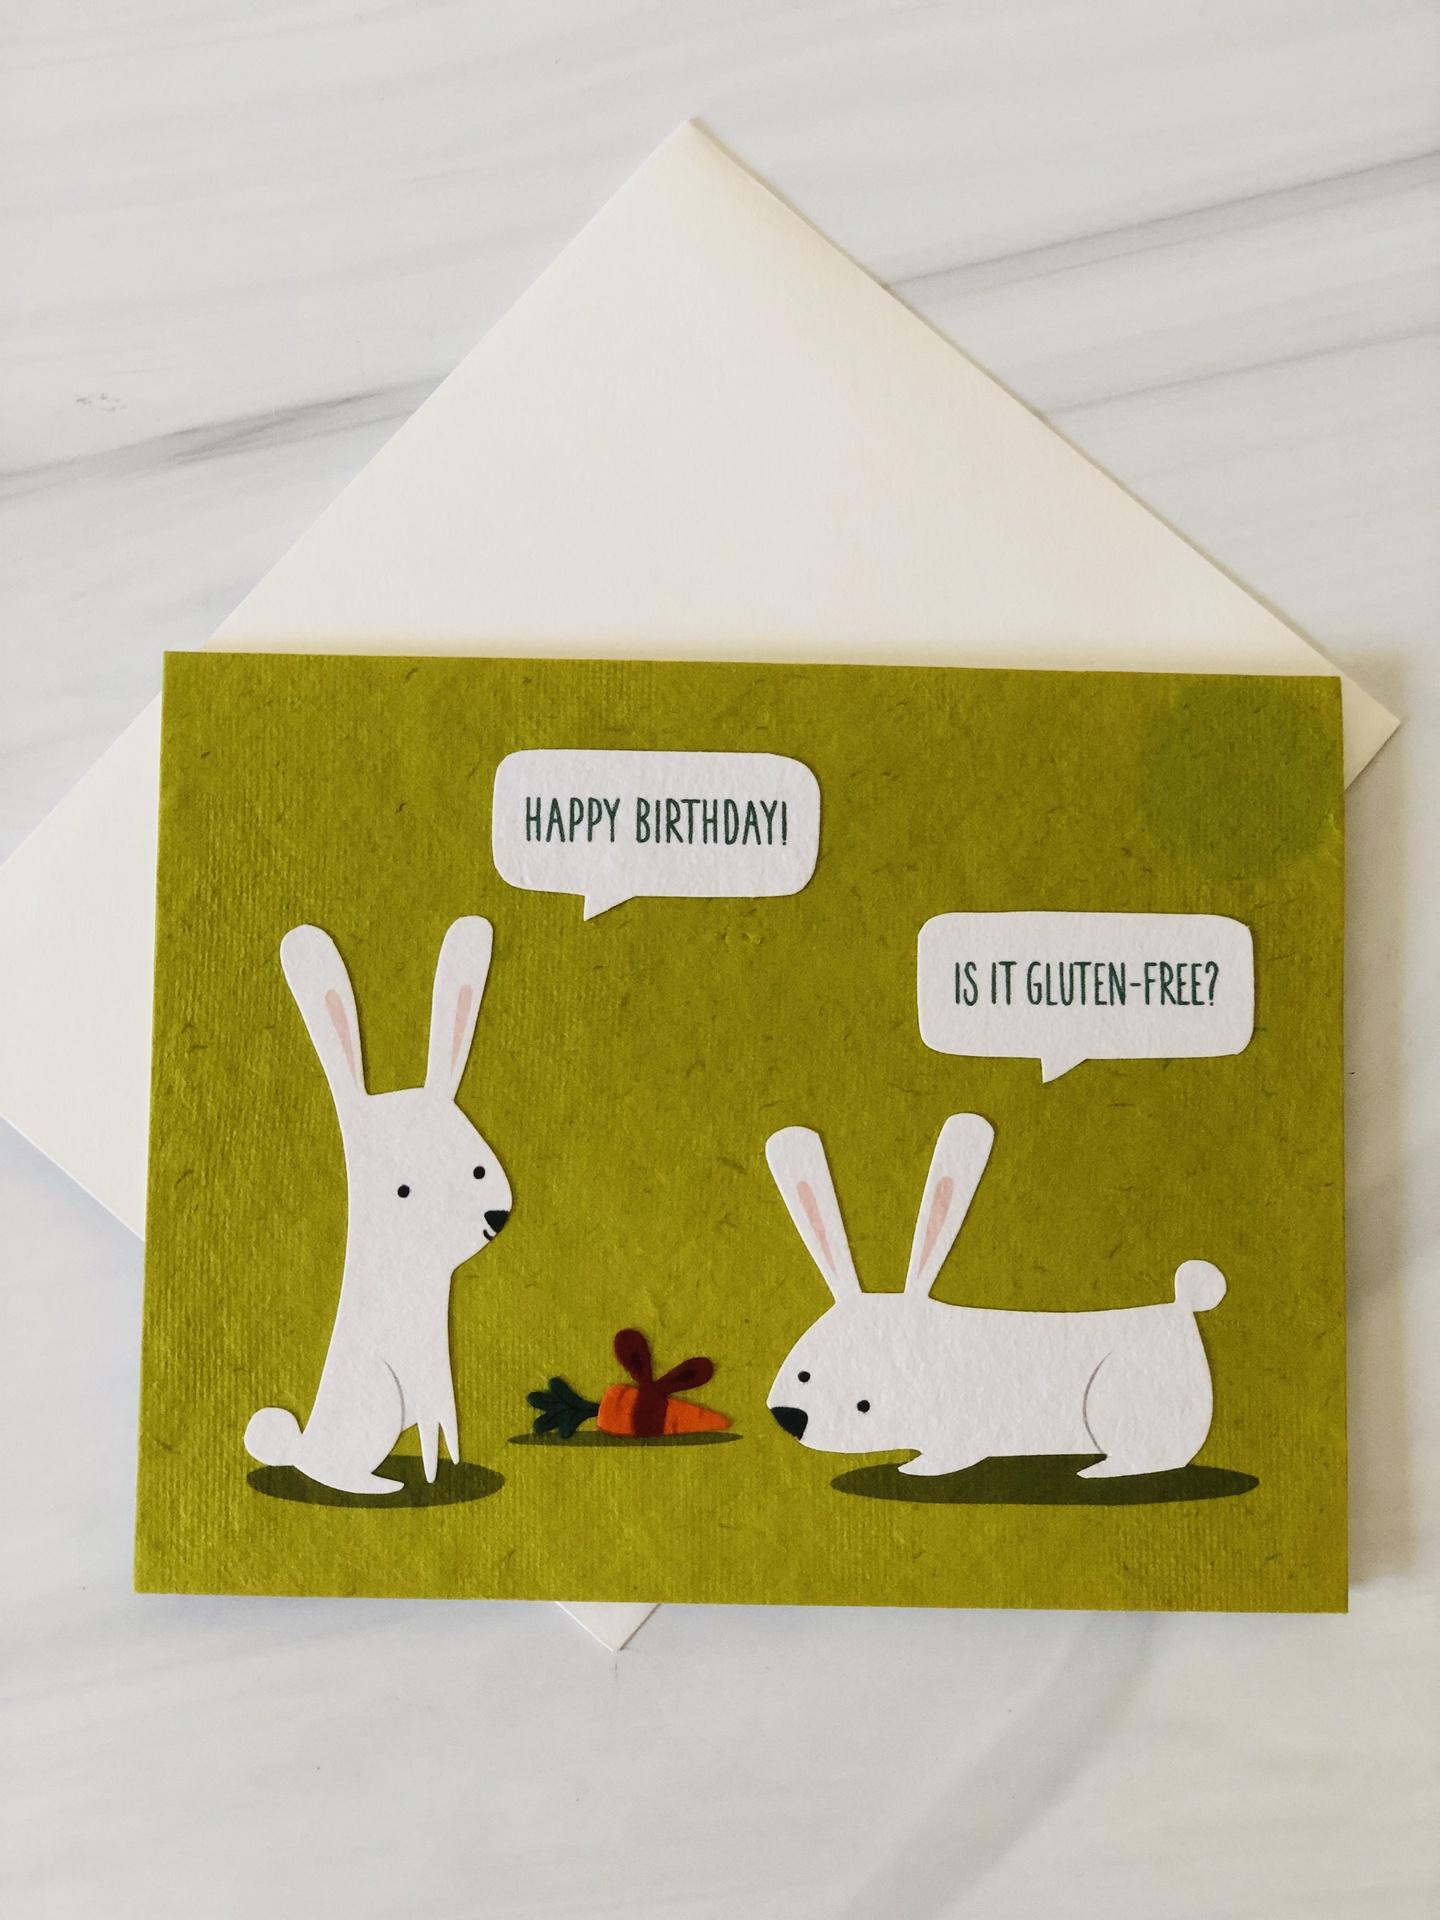 """HBD Gluten-Free"" Bunnies, Blank Greeting Card"